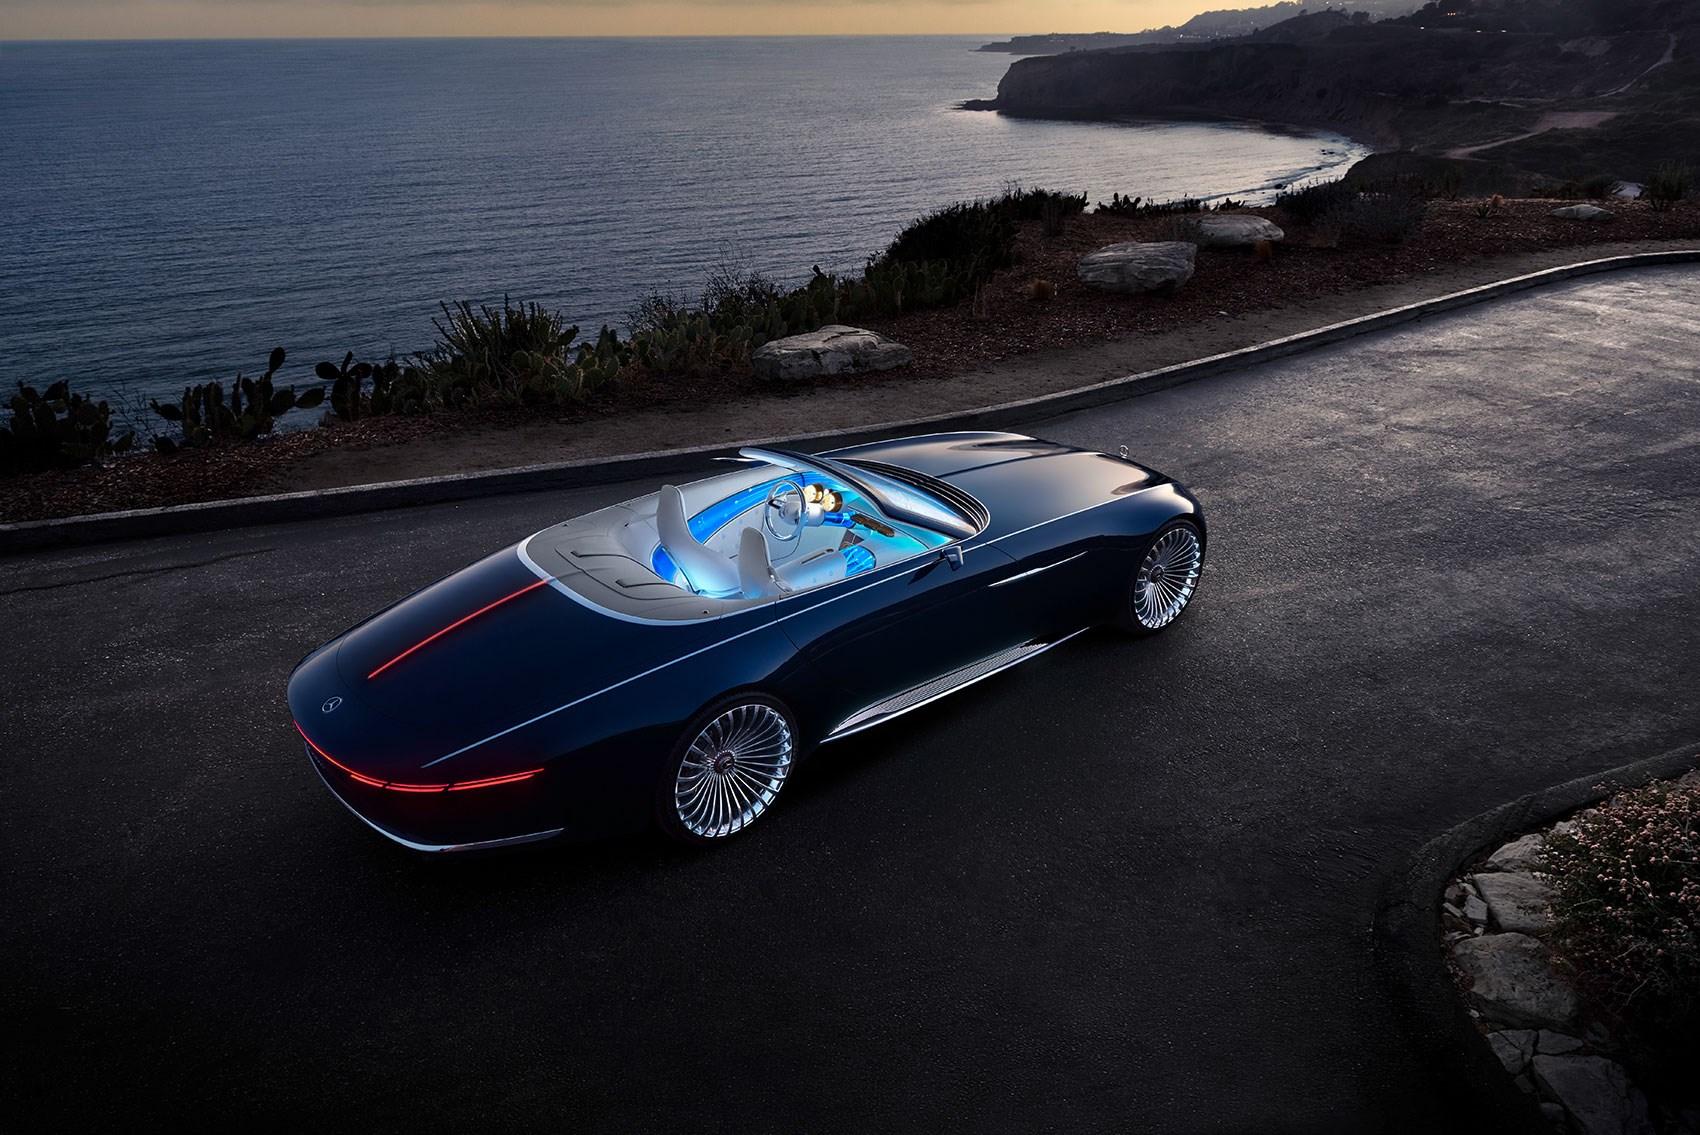 vision mercedes-maybach 6 cabriolet: news, photos, specs   car magazine